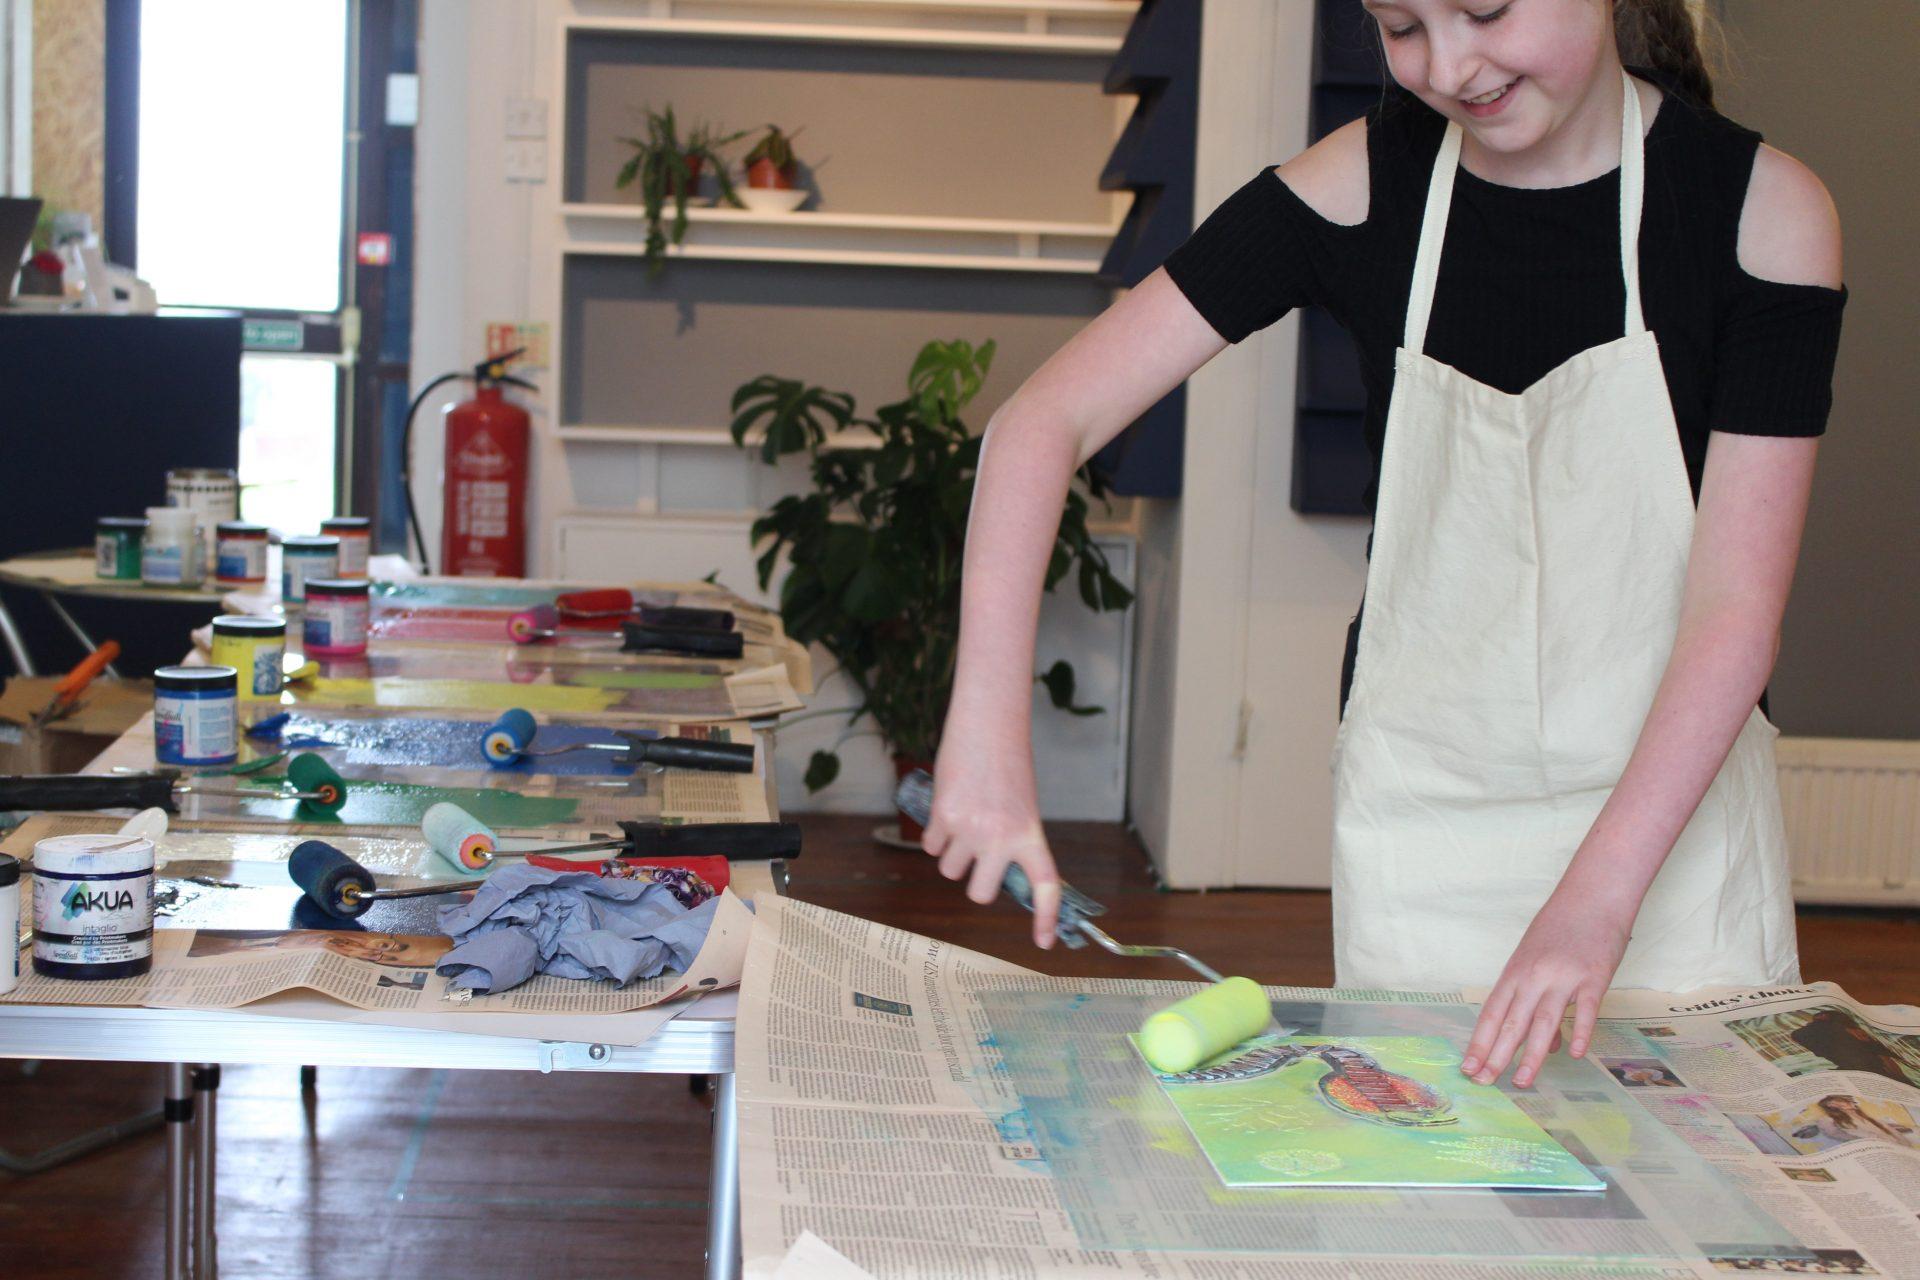 Collagraph printing masterclass with Nina Morgan